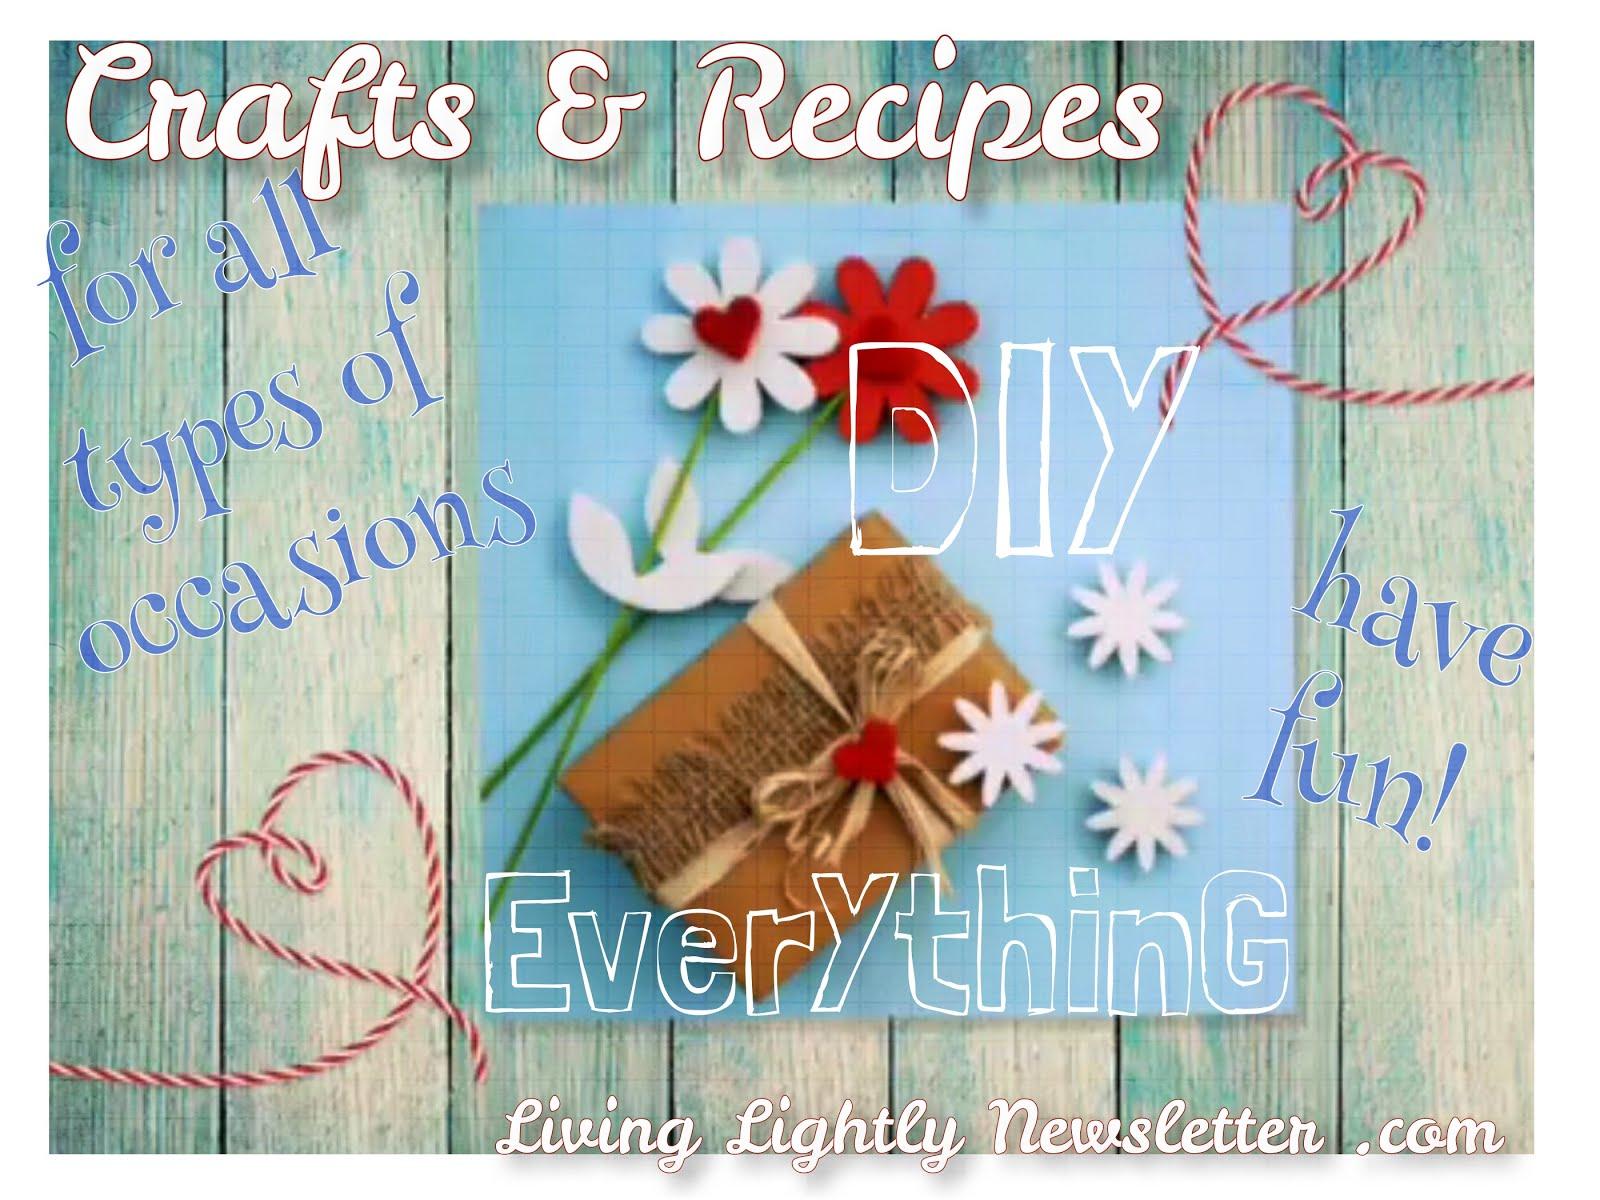 Manifesting, Crafts & Recipes!